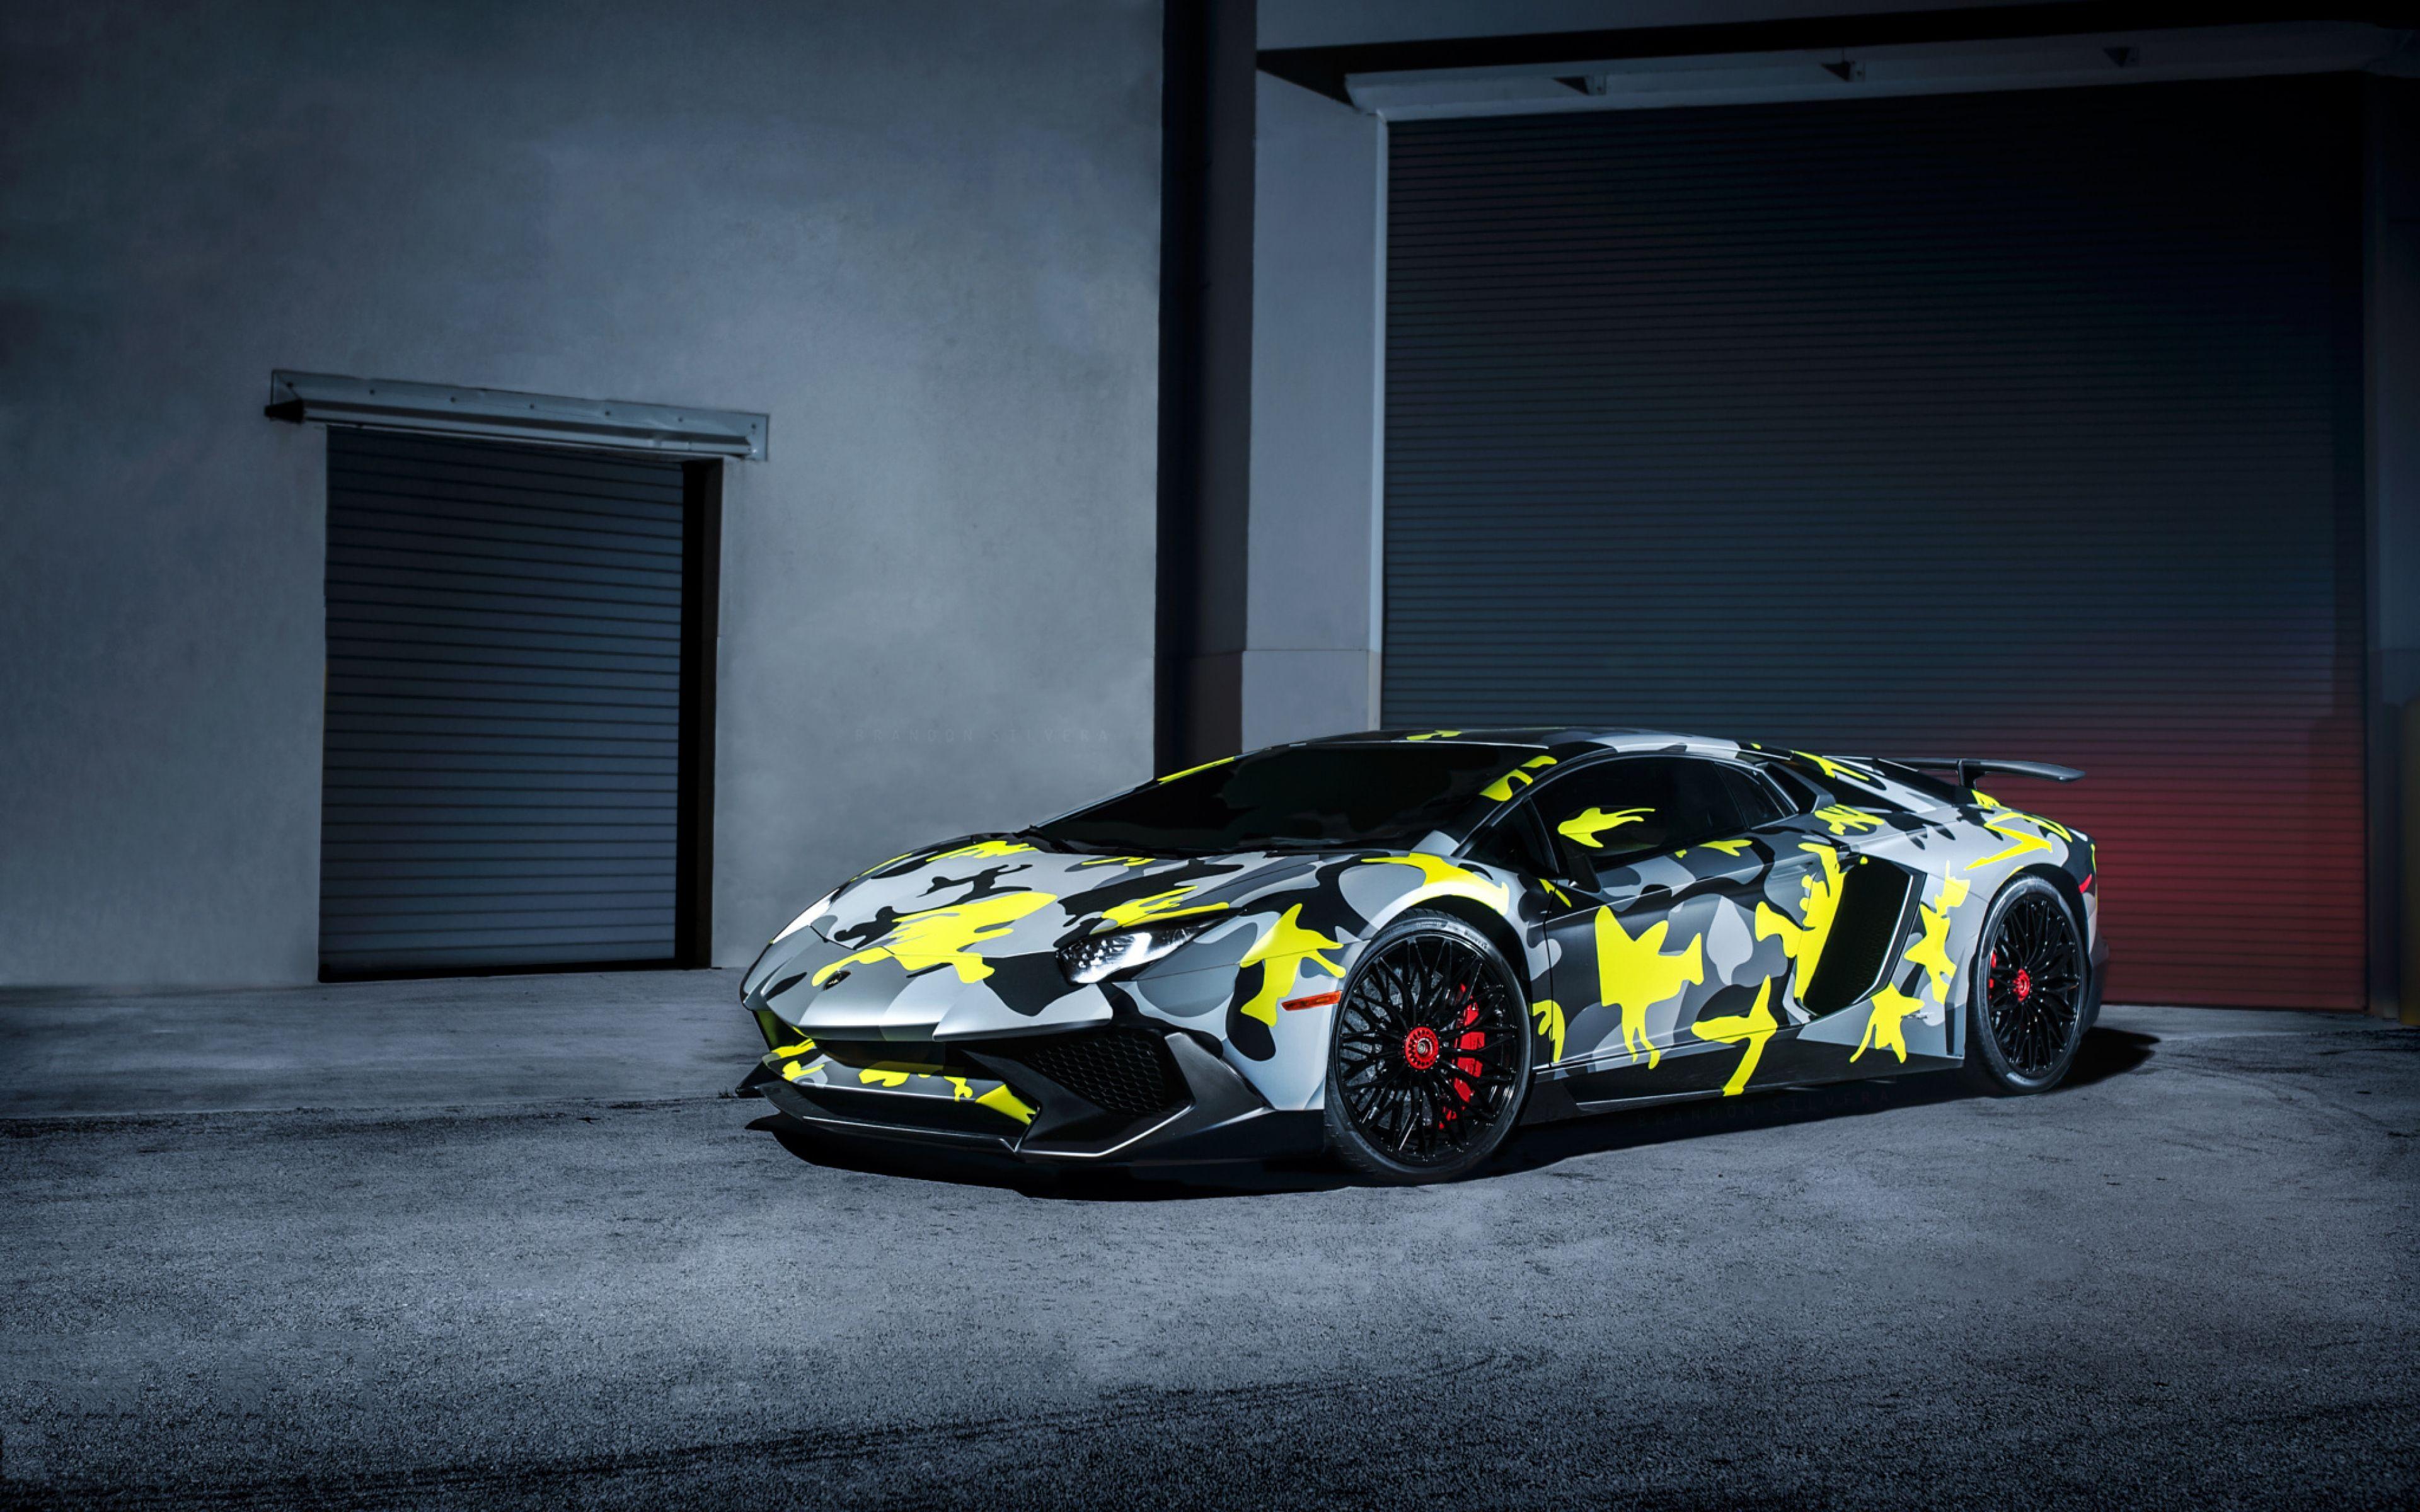 Cool Lamborghini Wallpaper Lamborghini Murcielago Sv Pinterest Lamborghini Sv Lamborghini Aventador Lamborghini